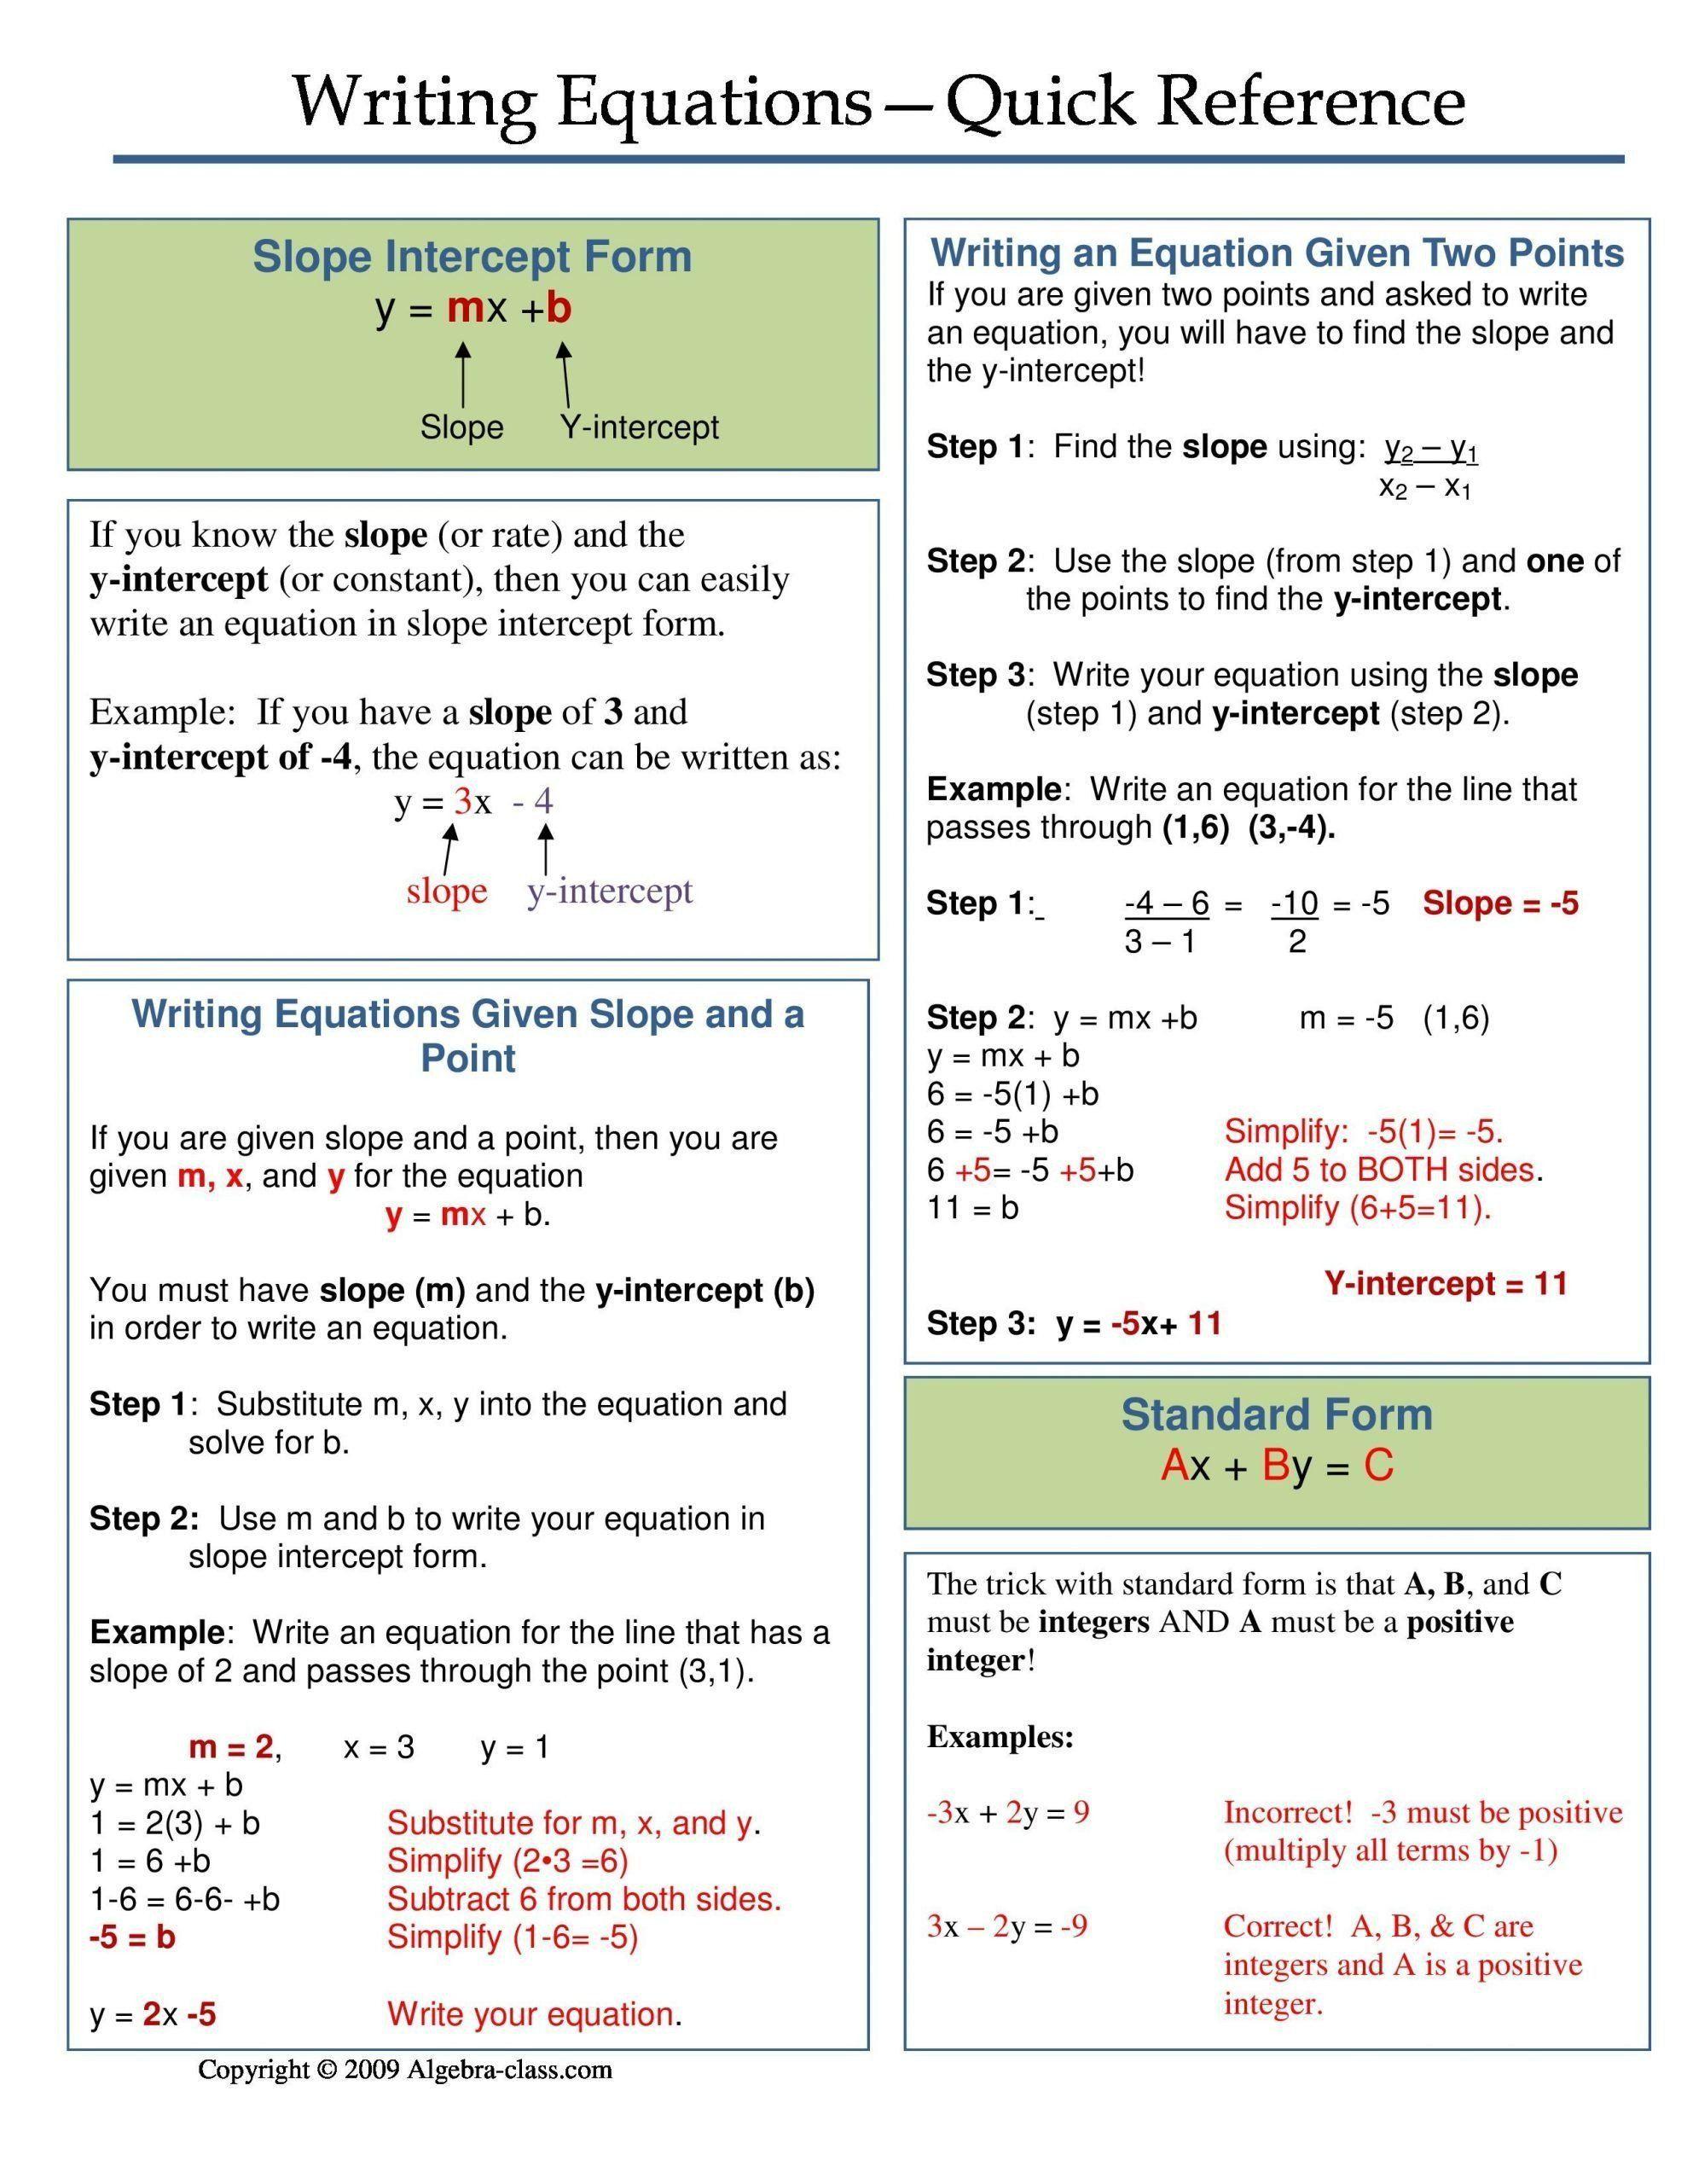 Writing A Function Rule Worksheet Pin On Printable Blank Worksheet Template In 2020 Writing Equations Teaching Algebra Teaching Math